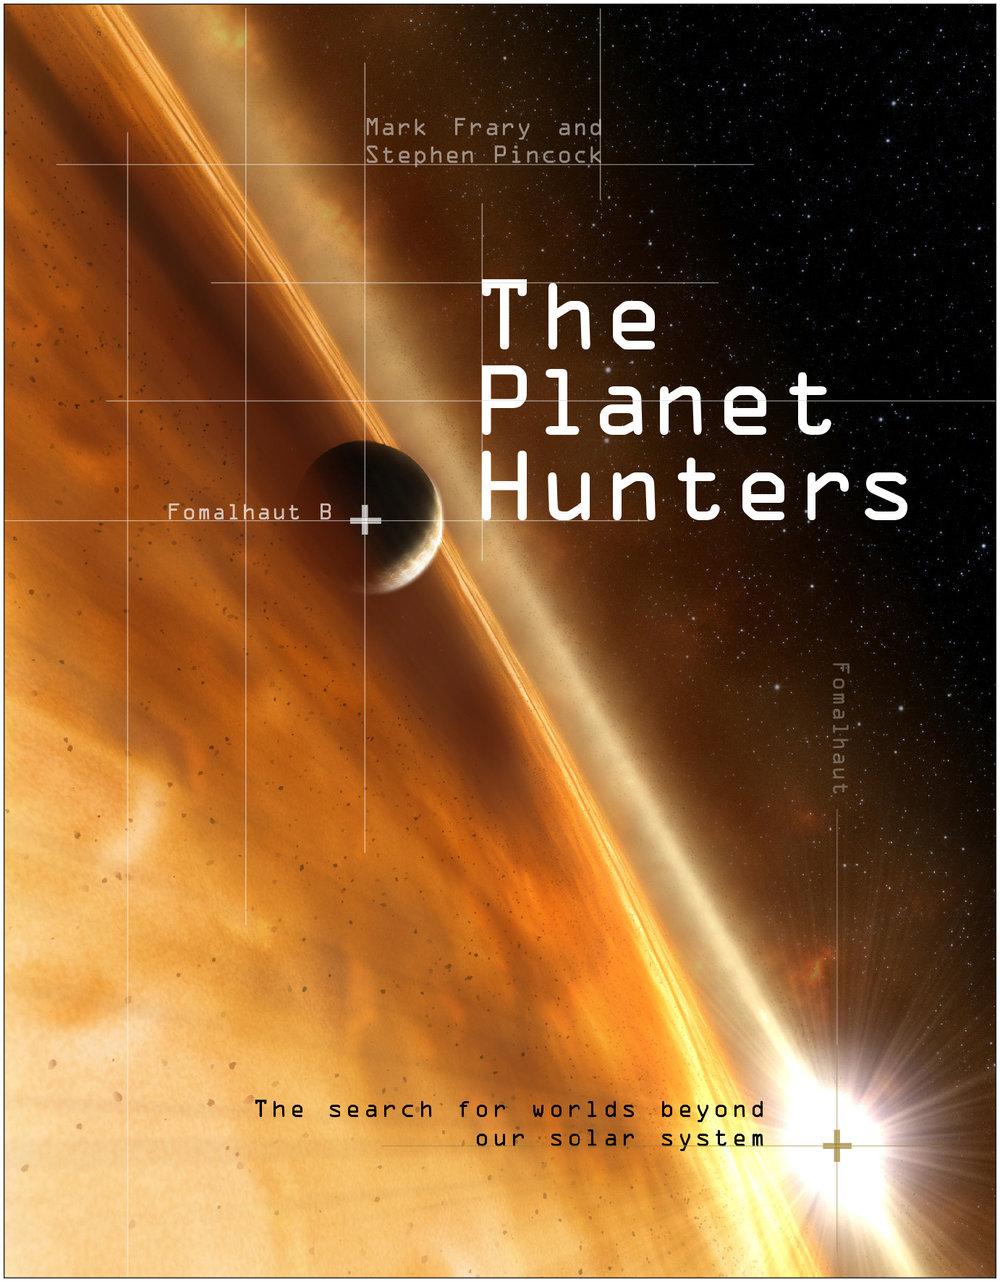 PLANETHUNTERS-2.jpg